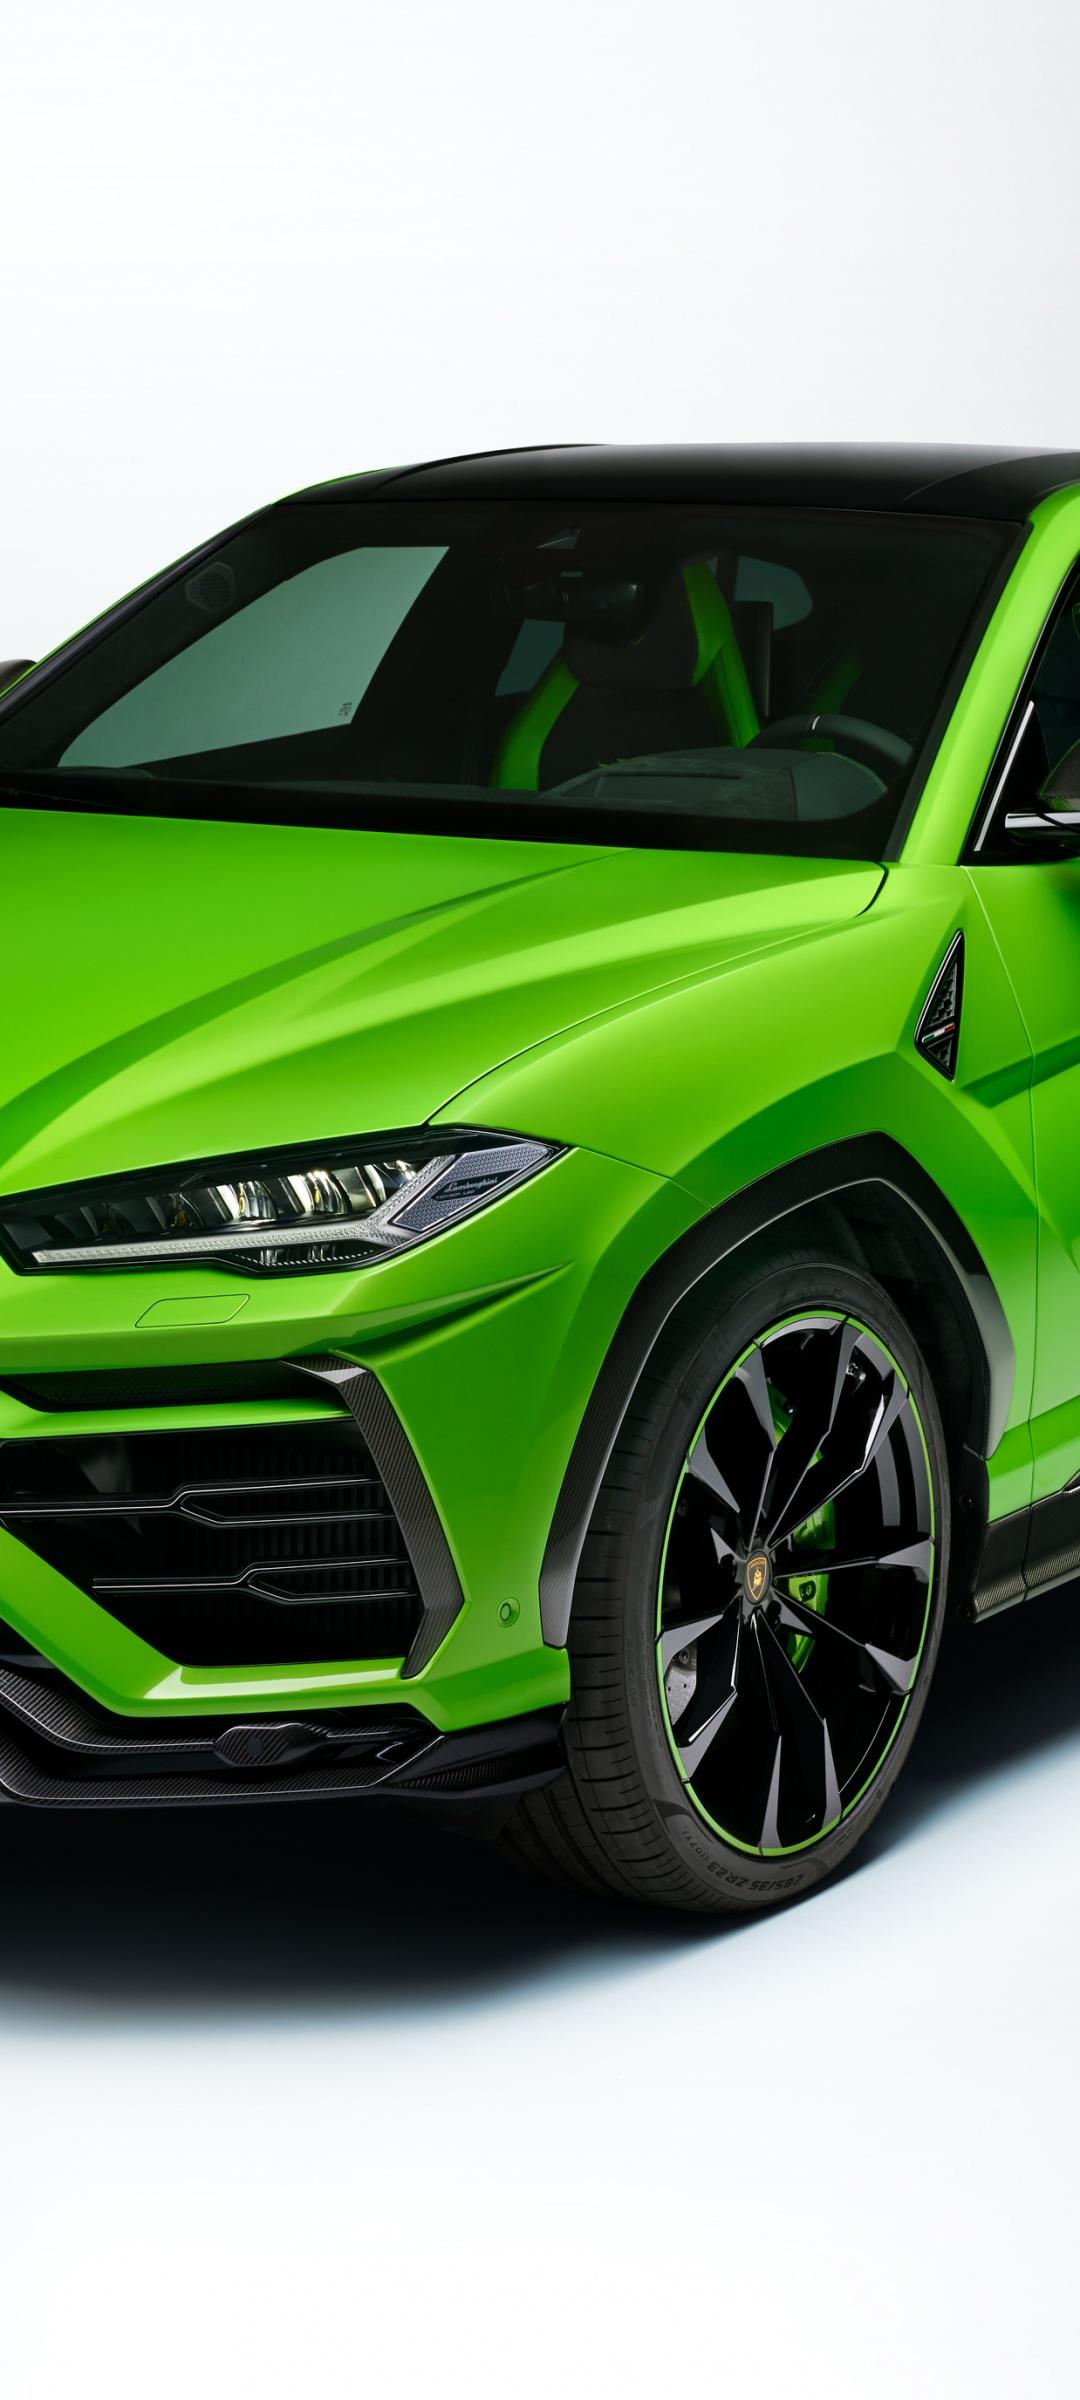 Lamborghini Urus Pearl Capsule 4k Wallpaper Green White Background 2020 Cars 1443